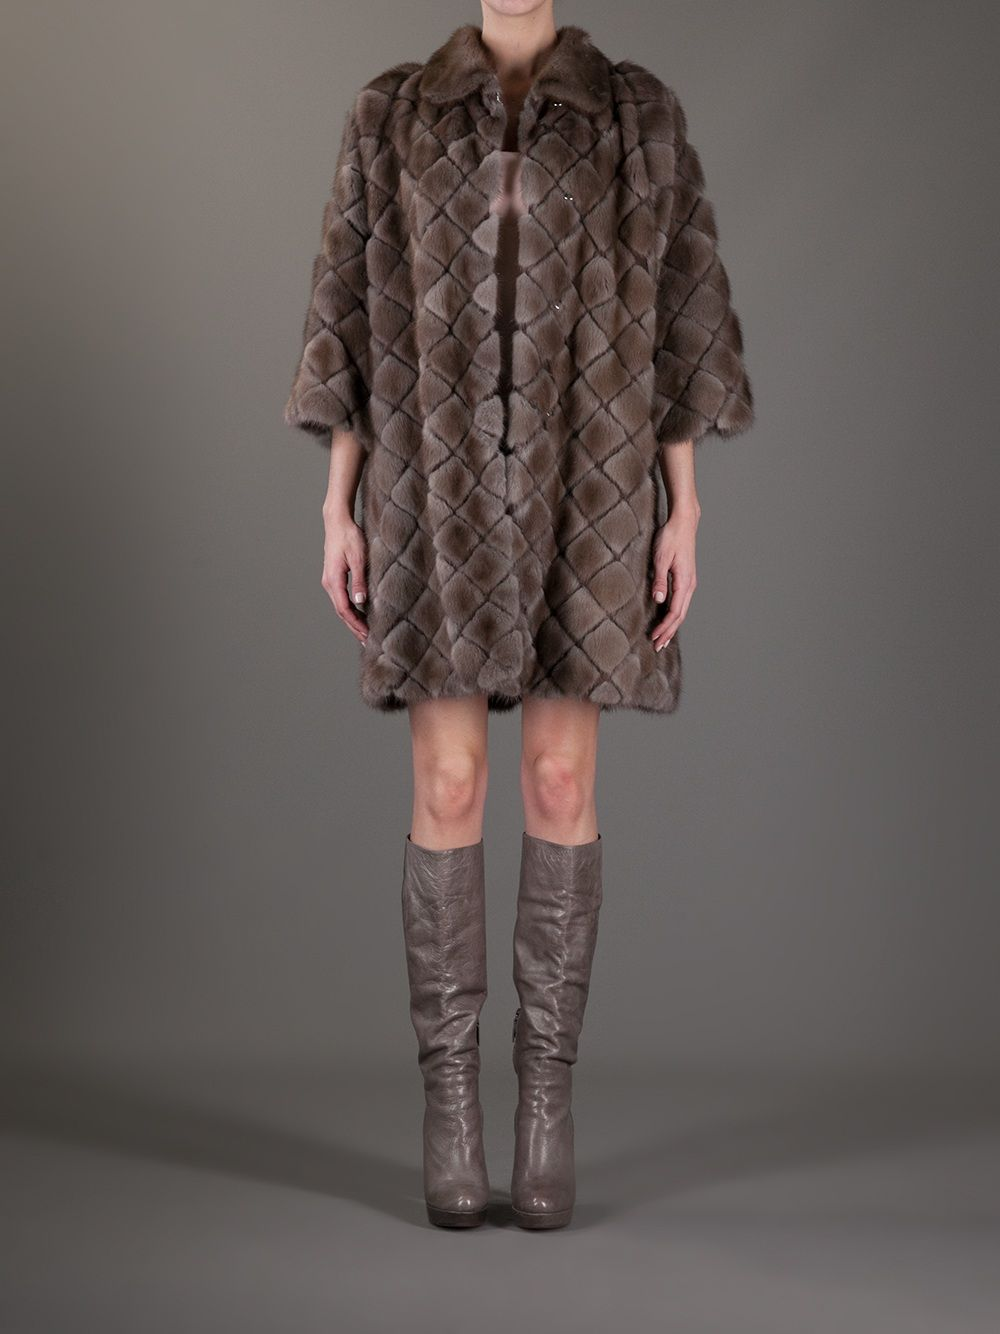 8deeac1fb7e4 Milusha Harlequin Shape Dark Pastel Mink Coat - Box Boutique - farfetch.com